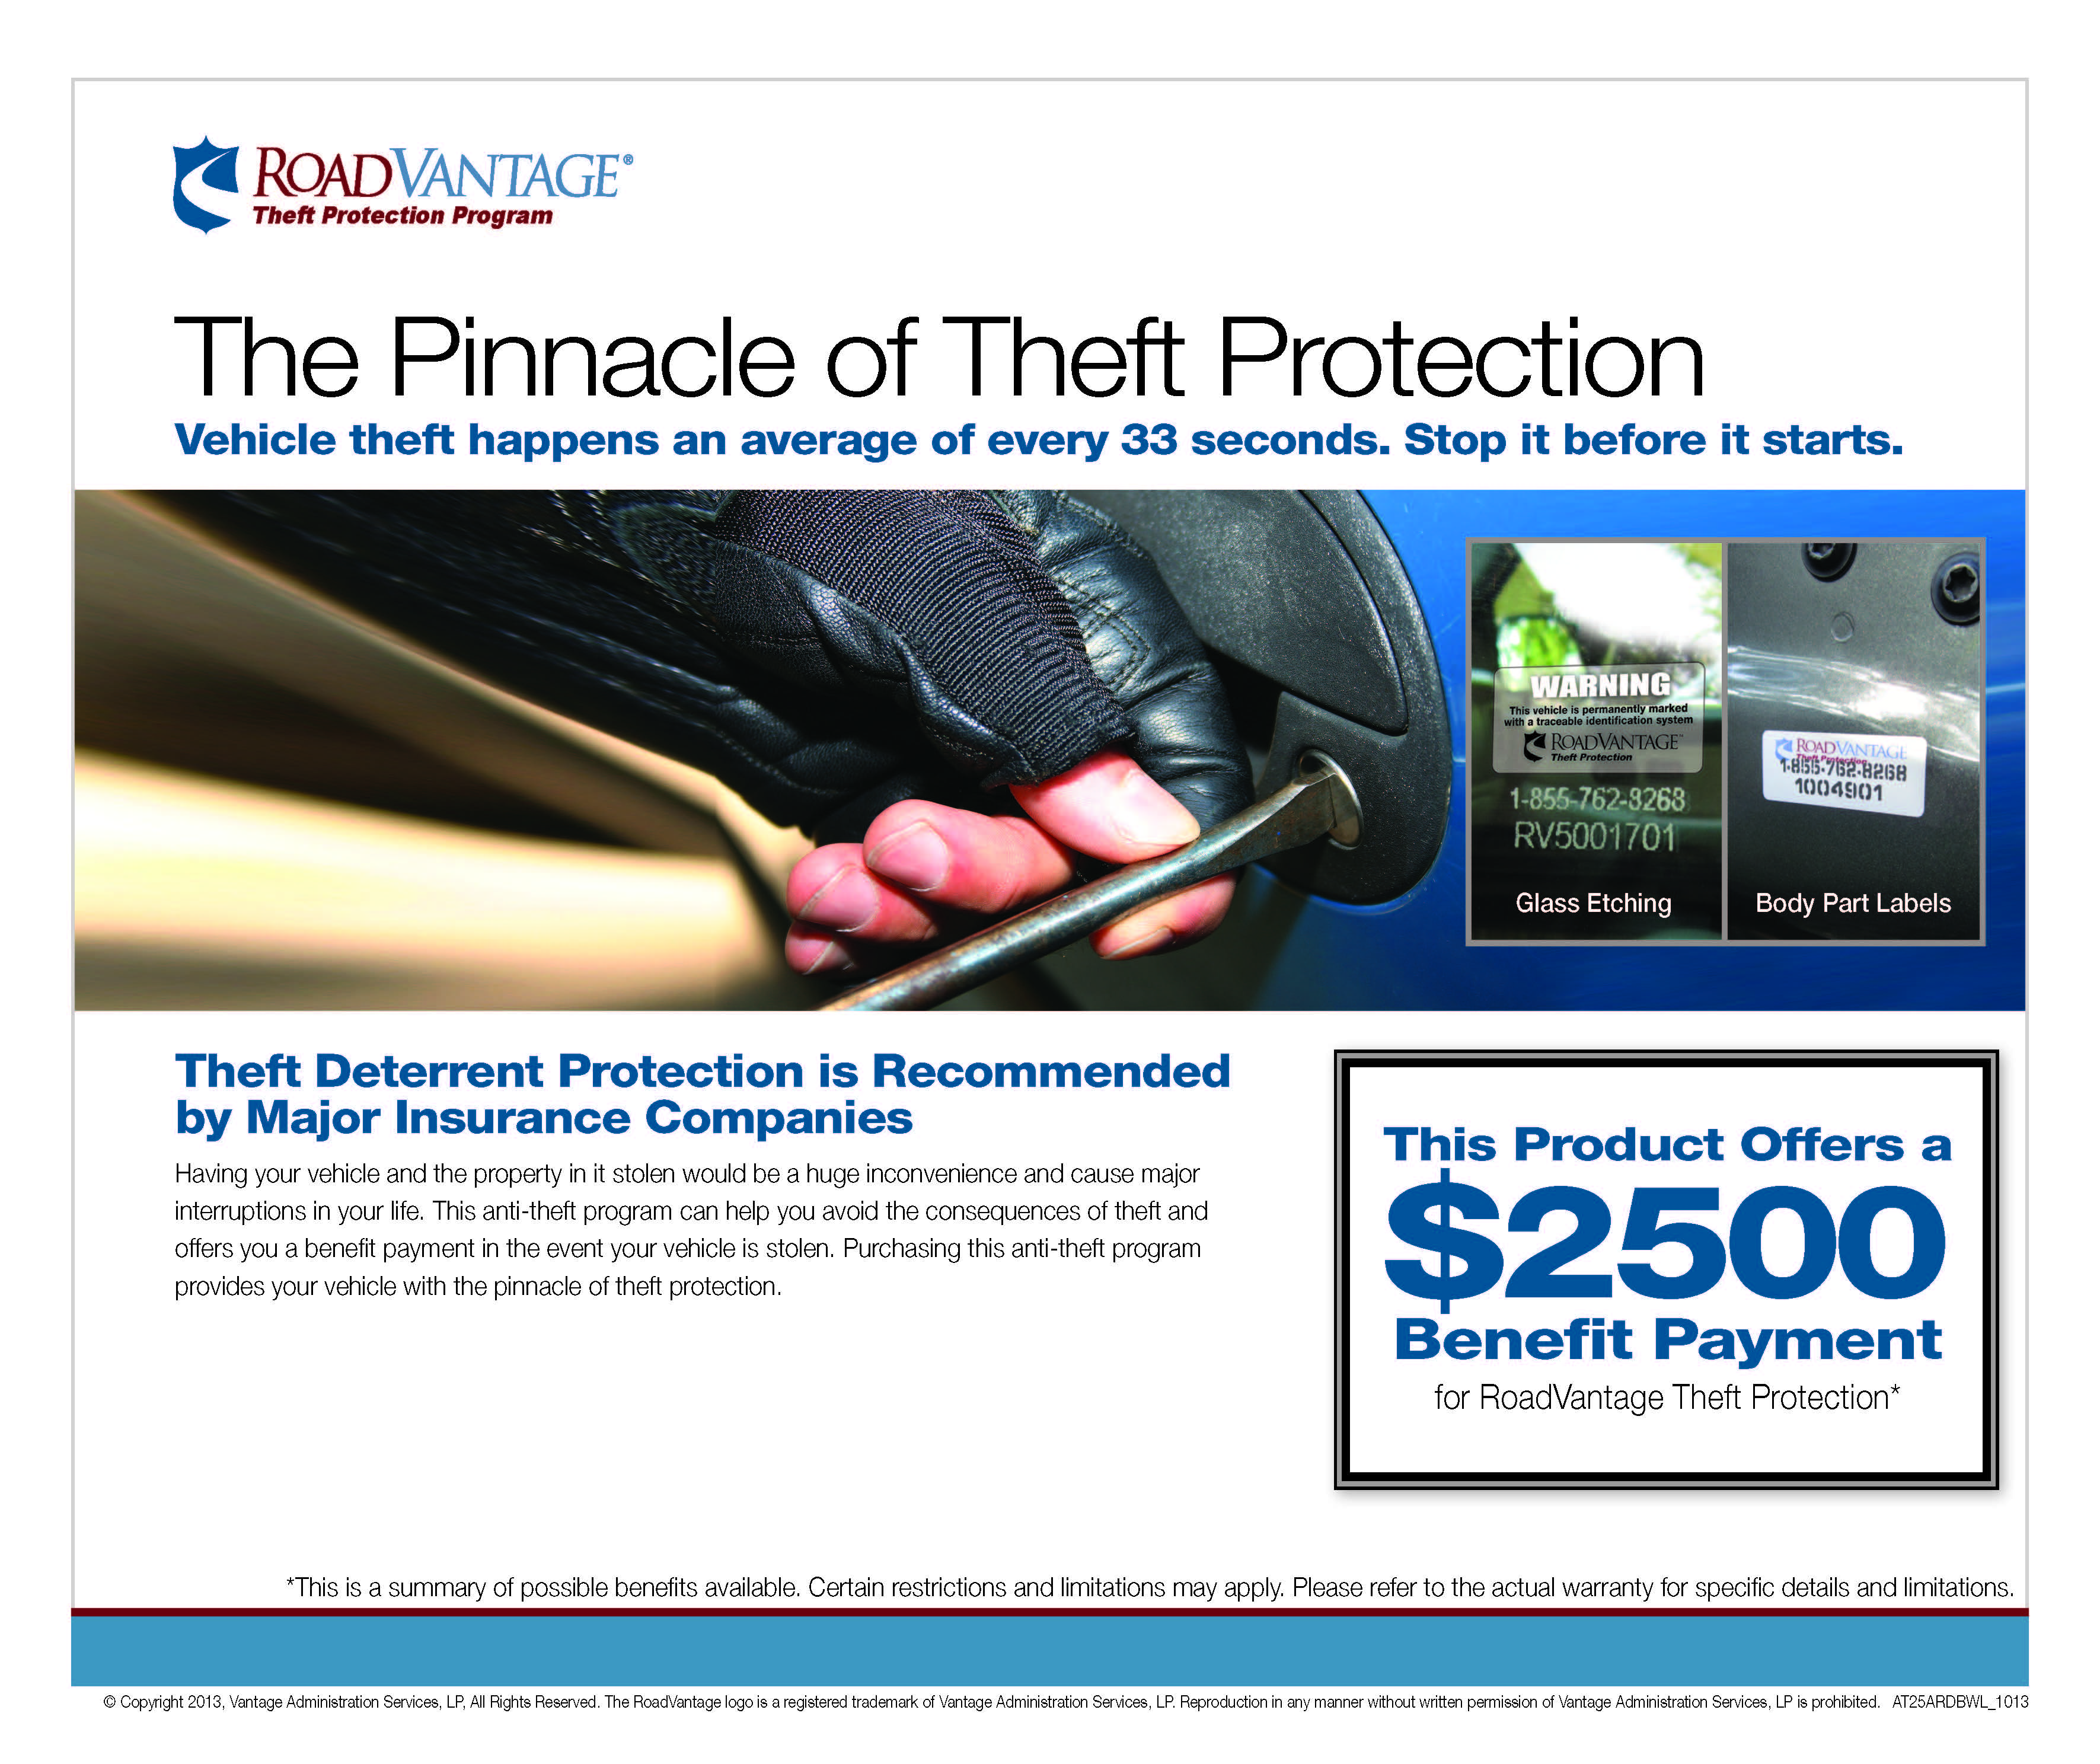 AT25ARDBWL_RDV_Lam_Anti-Theft_$2500